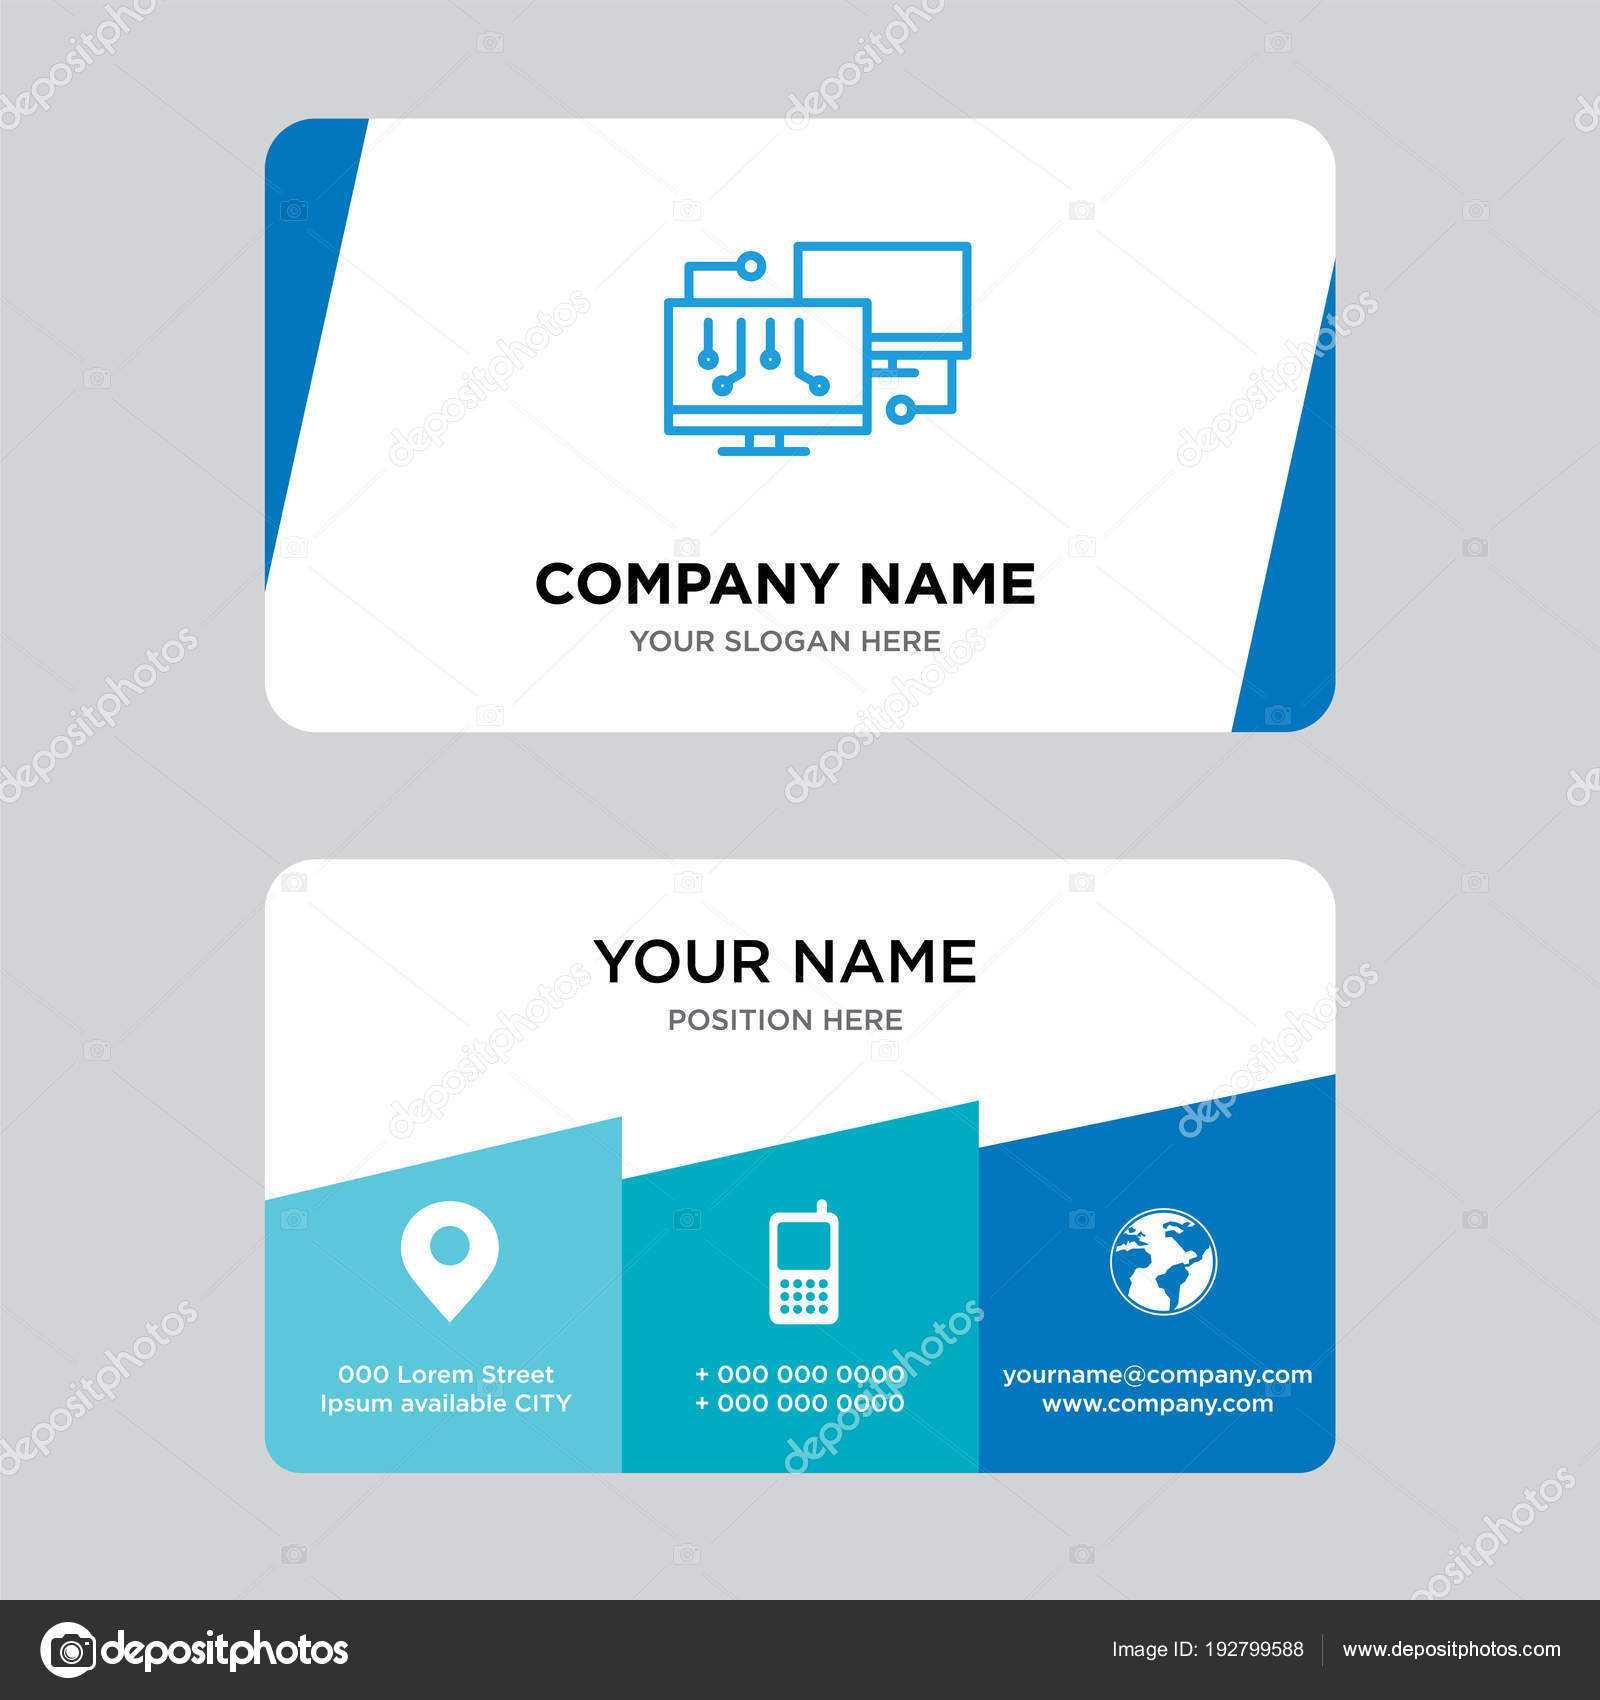 Network Business Card Design Template — Stock Vector Regarding Networking Card Template